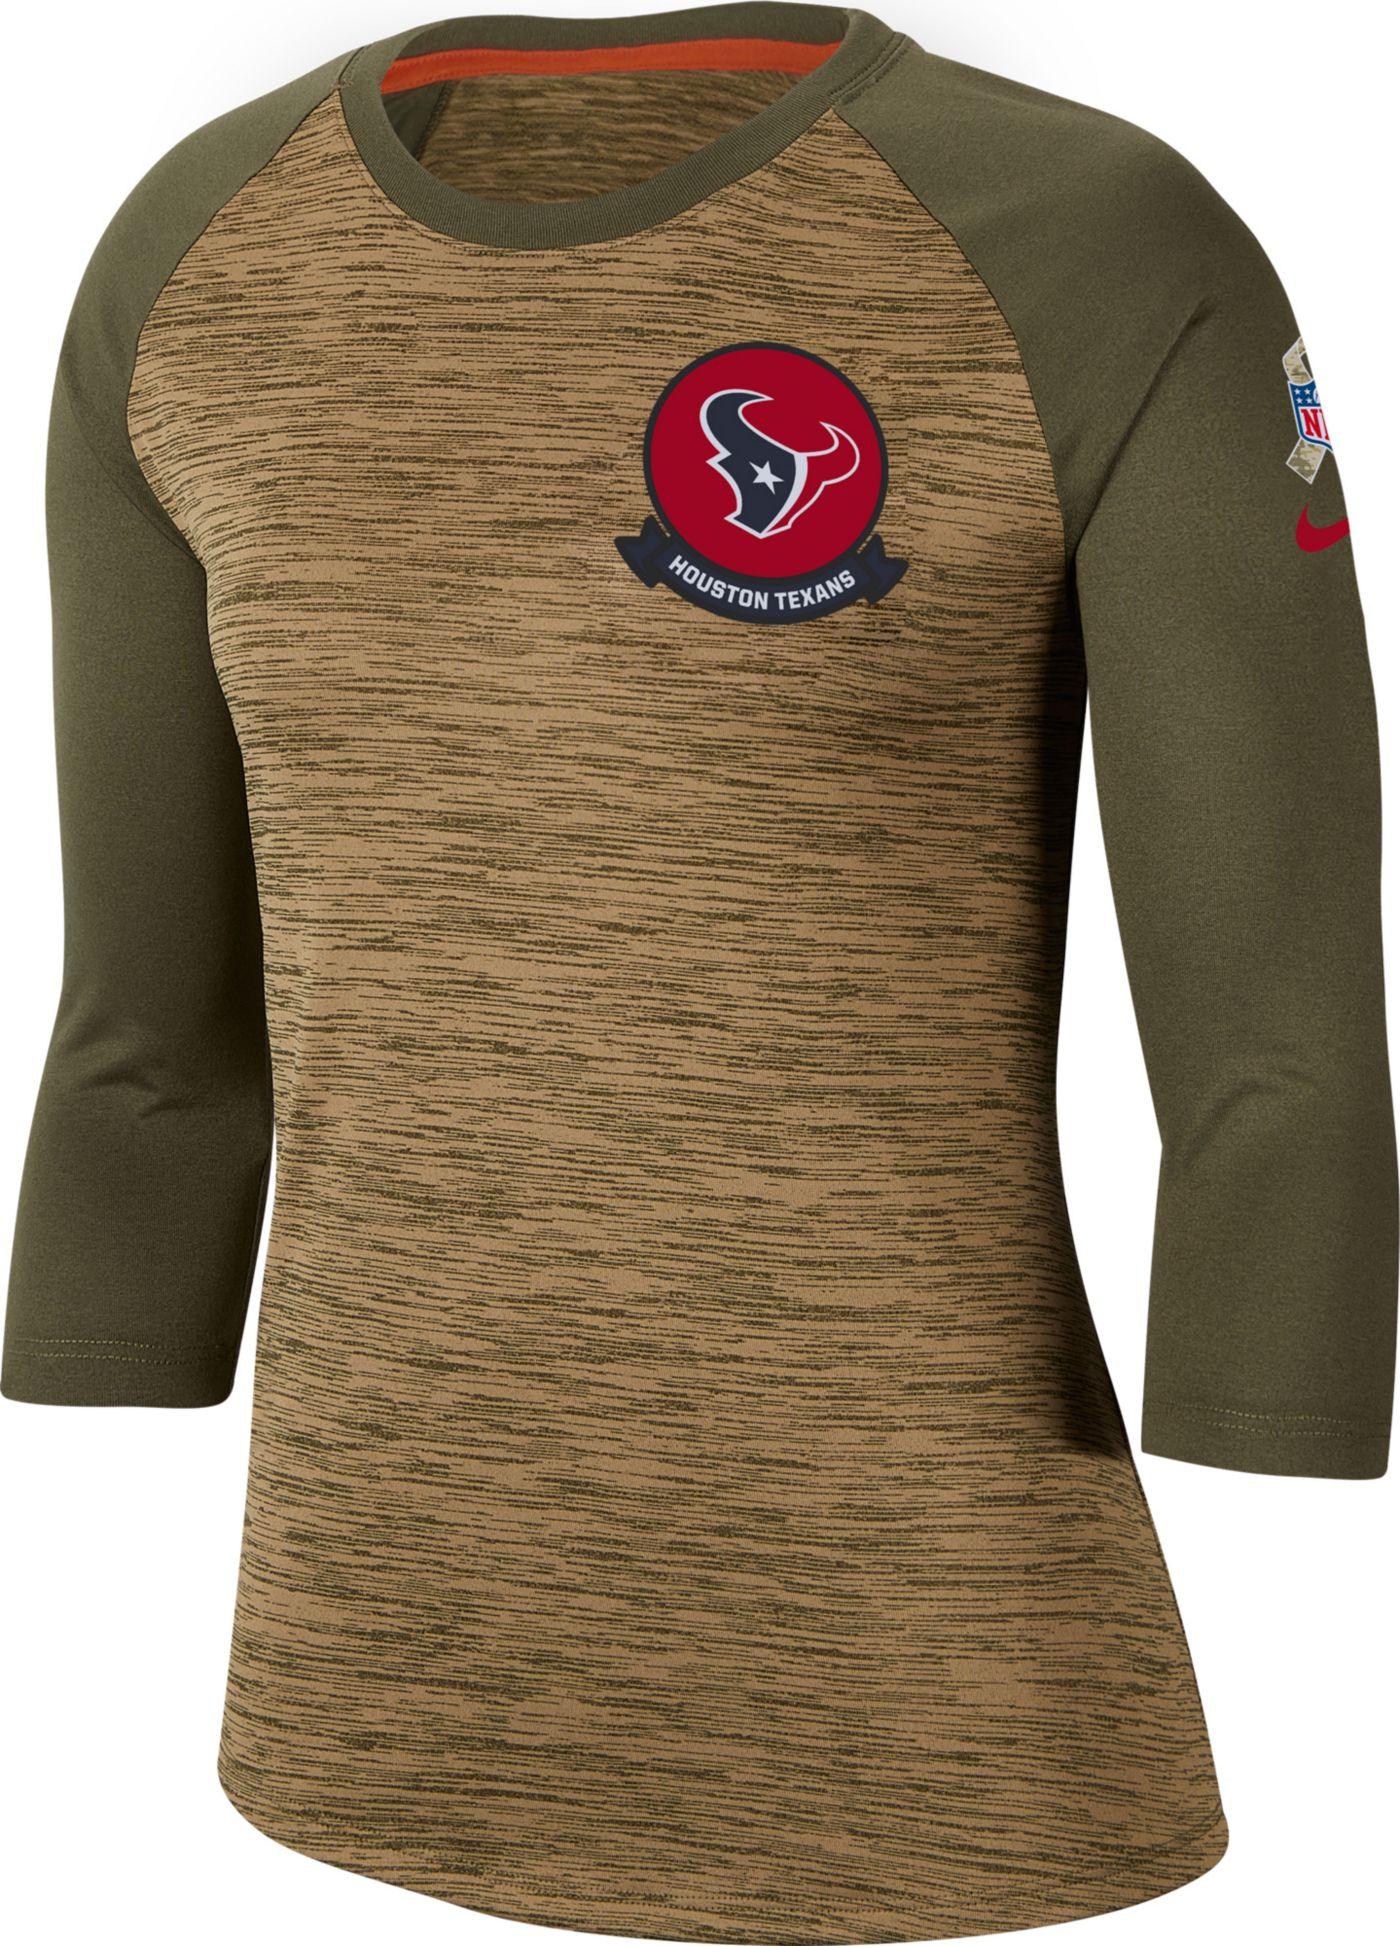 Nike Women's Salute to Service Houston Texans Dri-FIT Beige Raglan Shirt